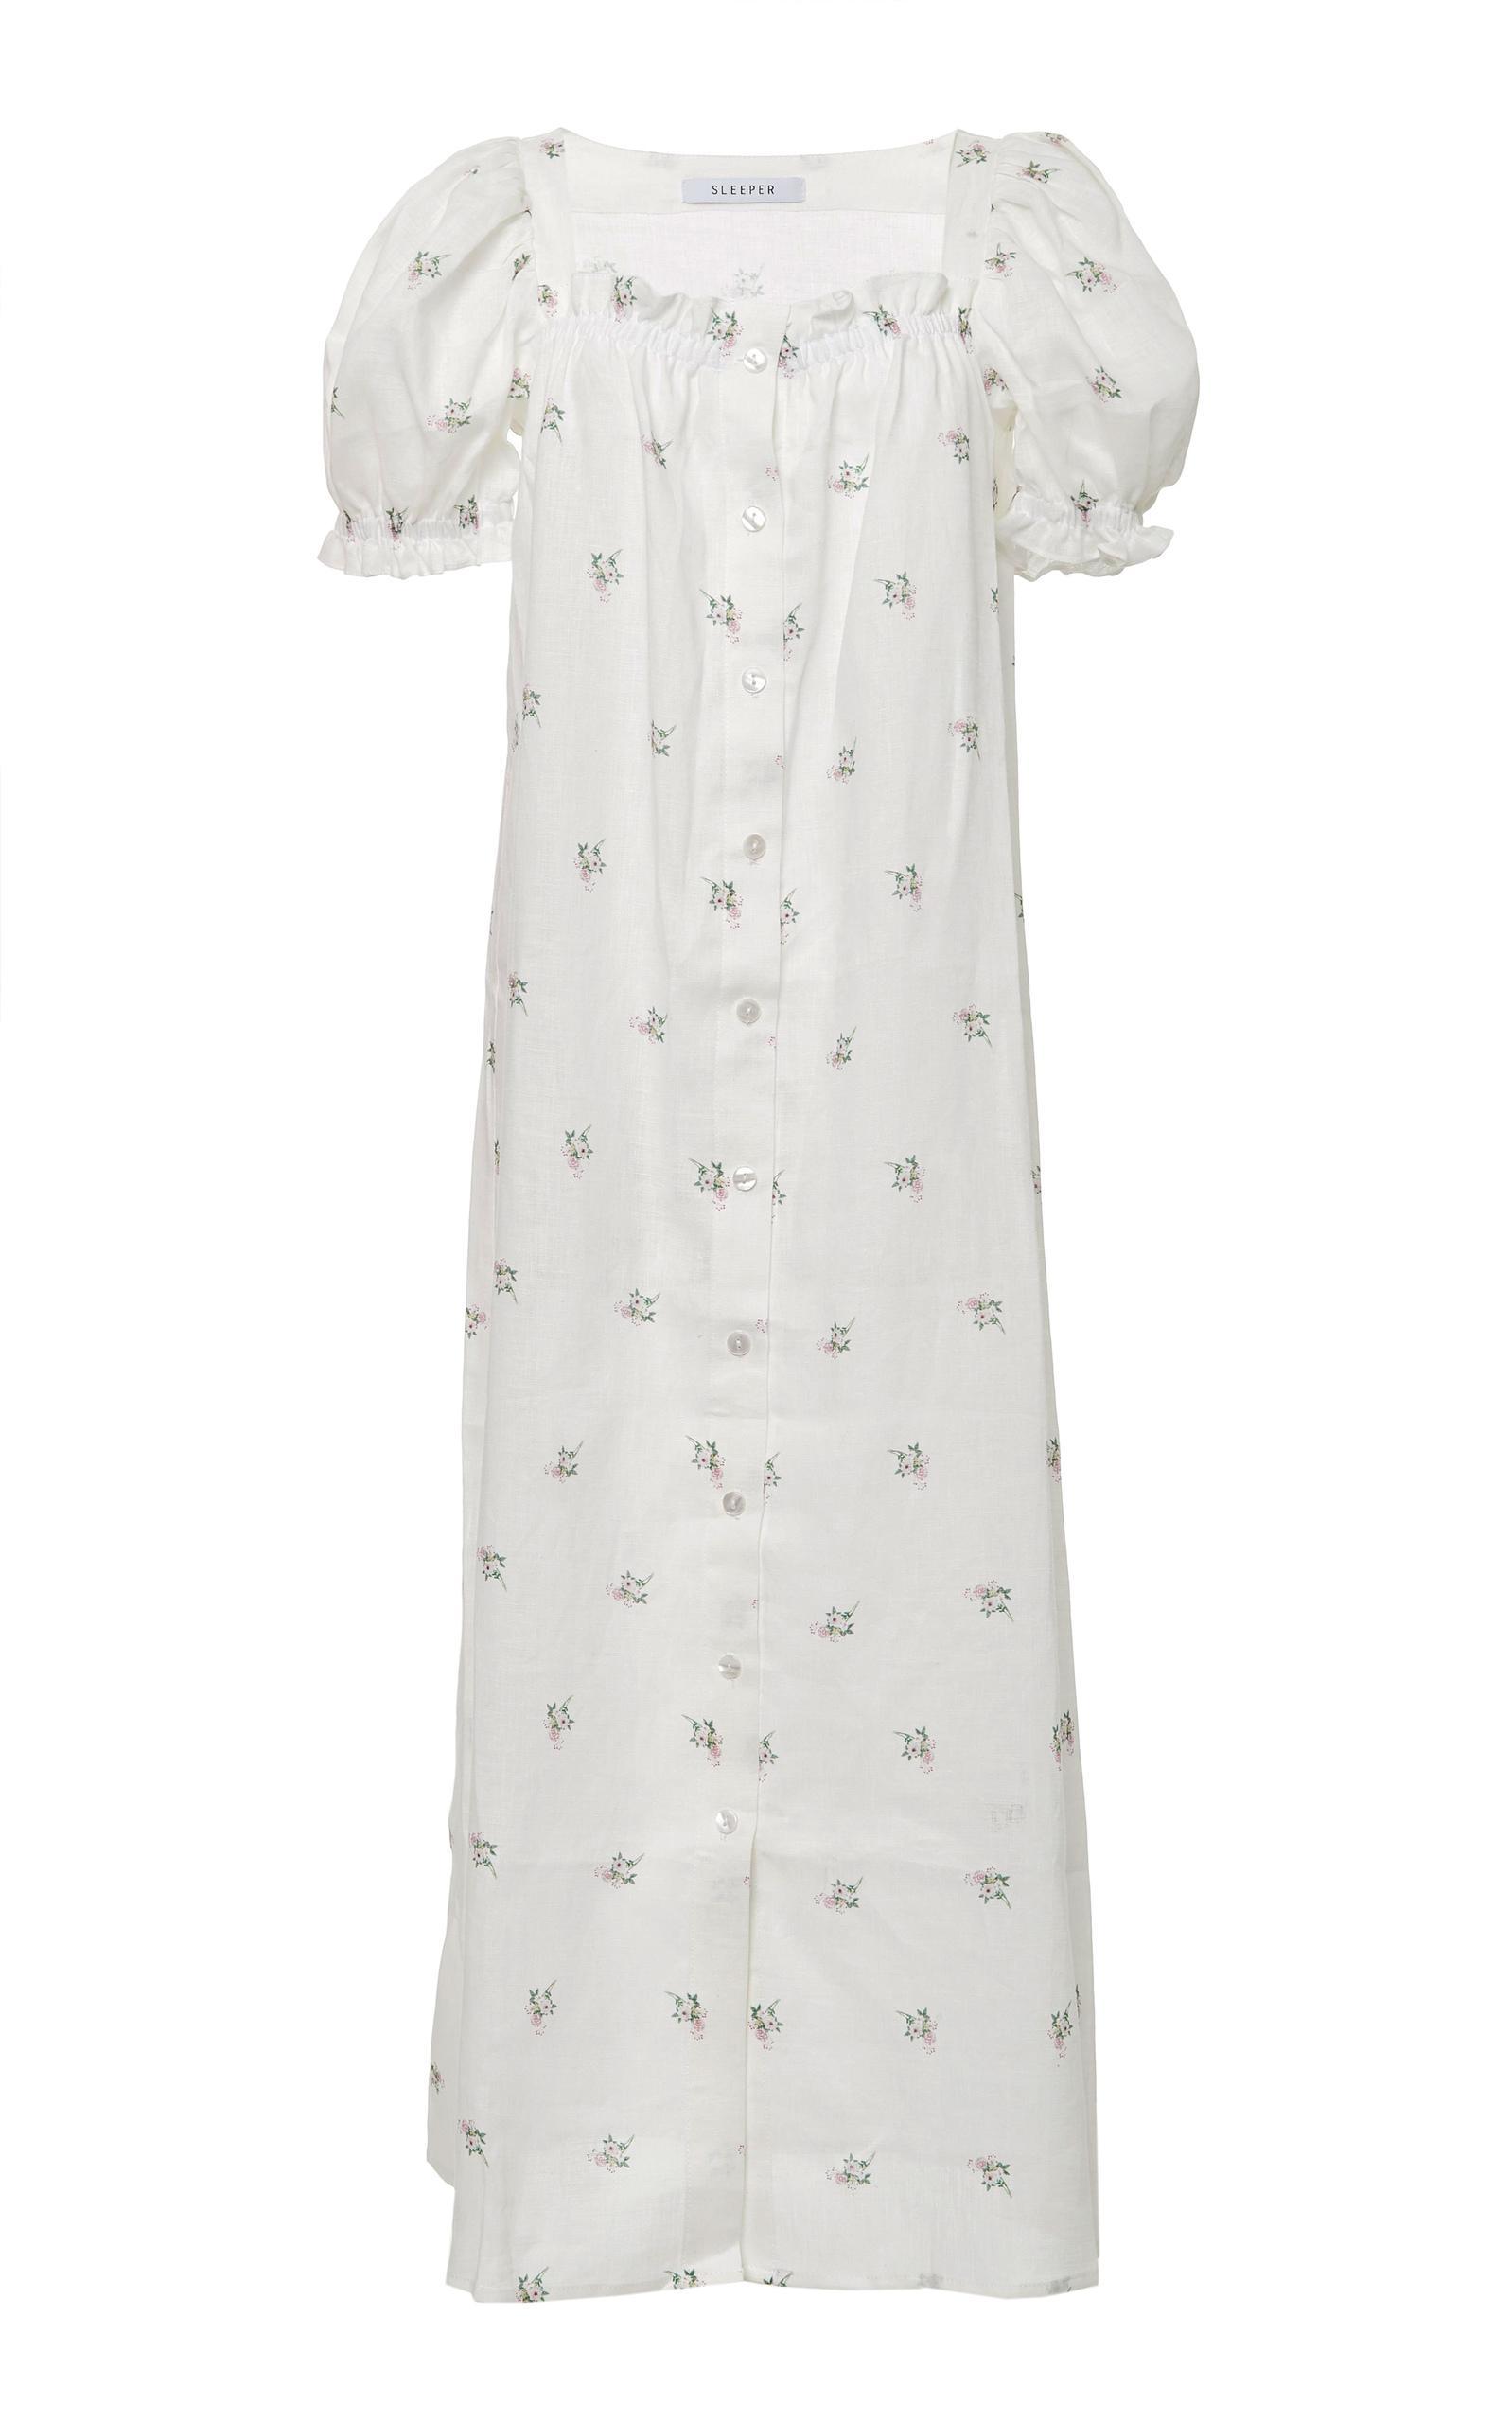 8af6dd9a01 Lyst - Sleeper Brigitte Linen Flower Printed Long Dress in White